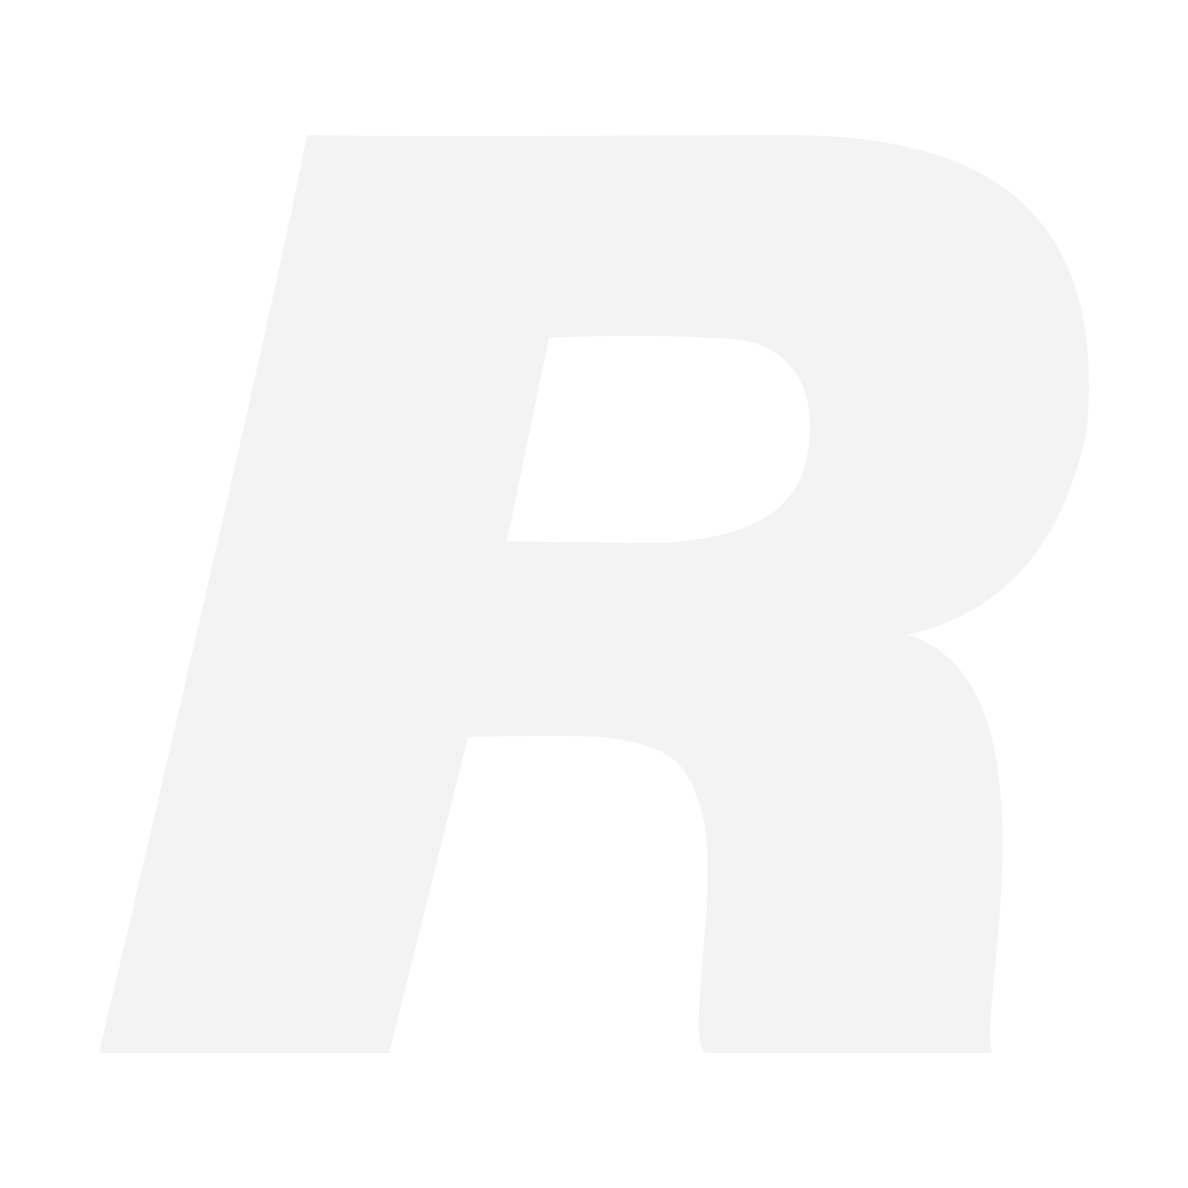 SONY FDA-EV1MK (RX1)